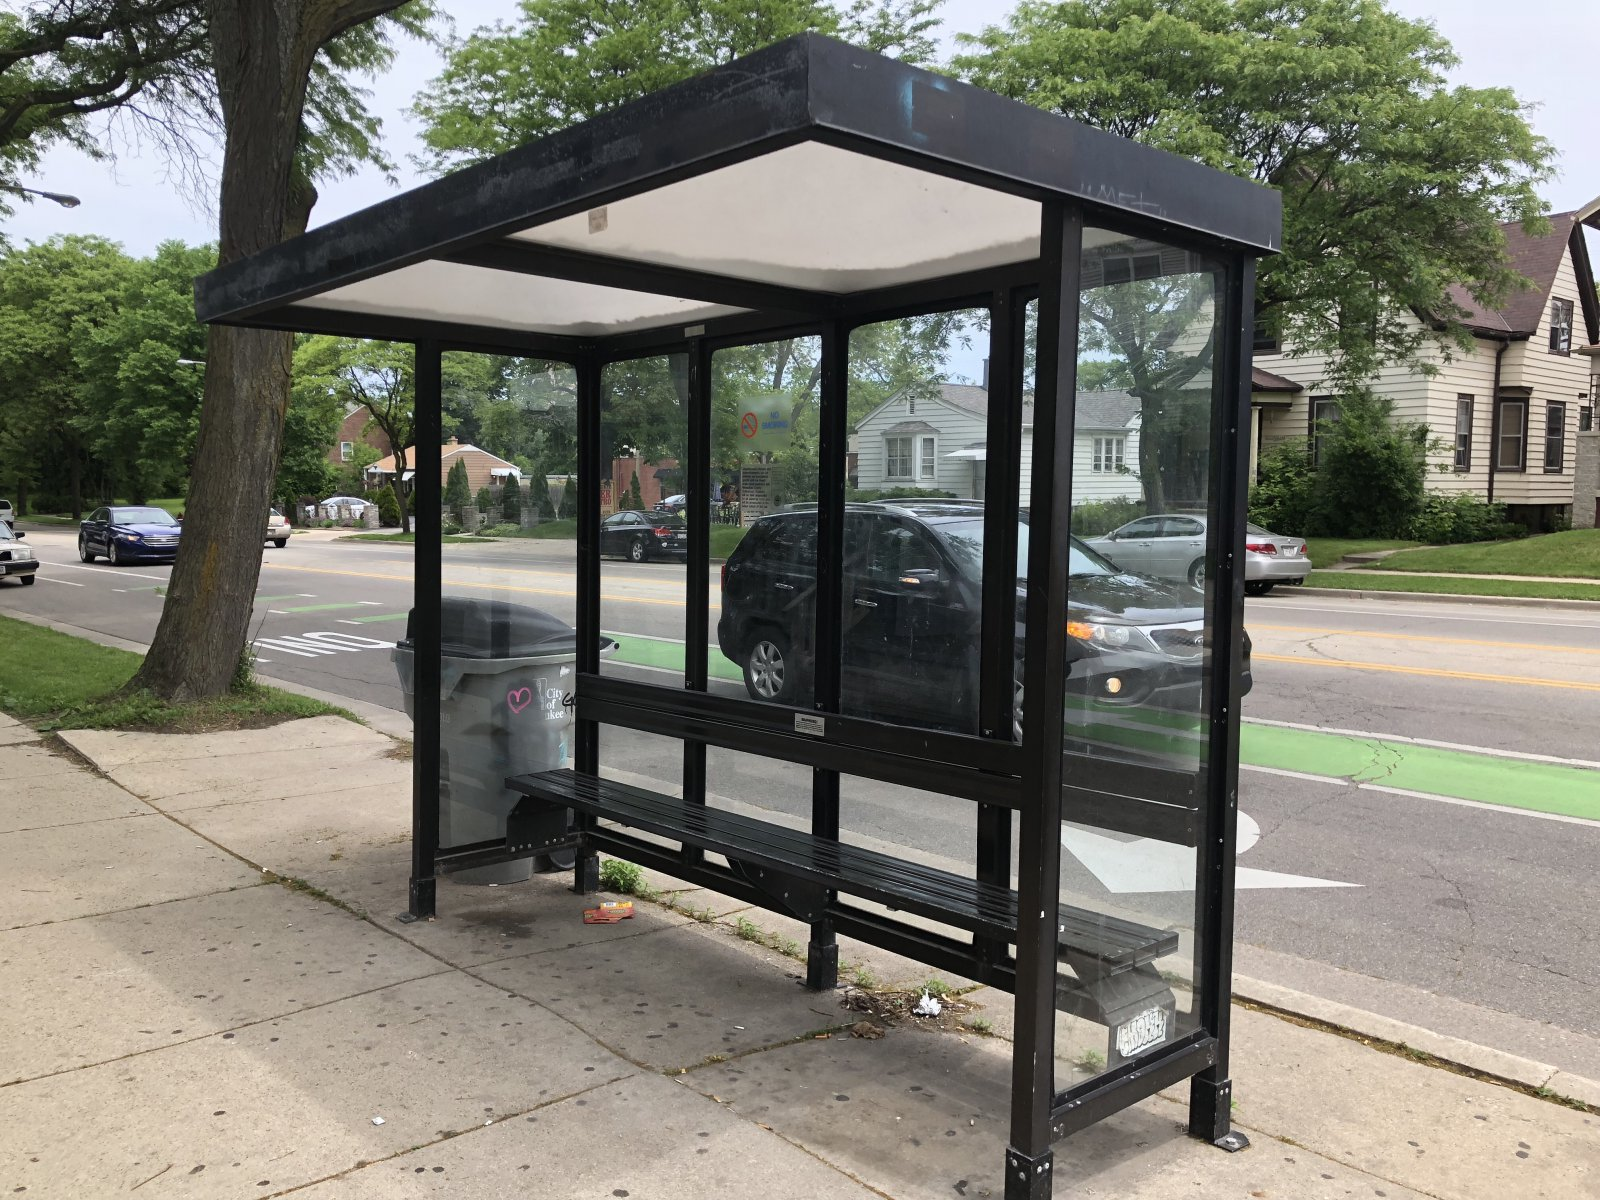 Standard Bus Shelter